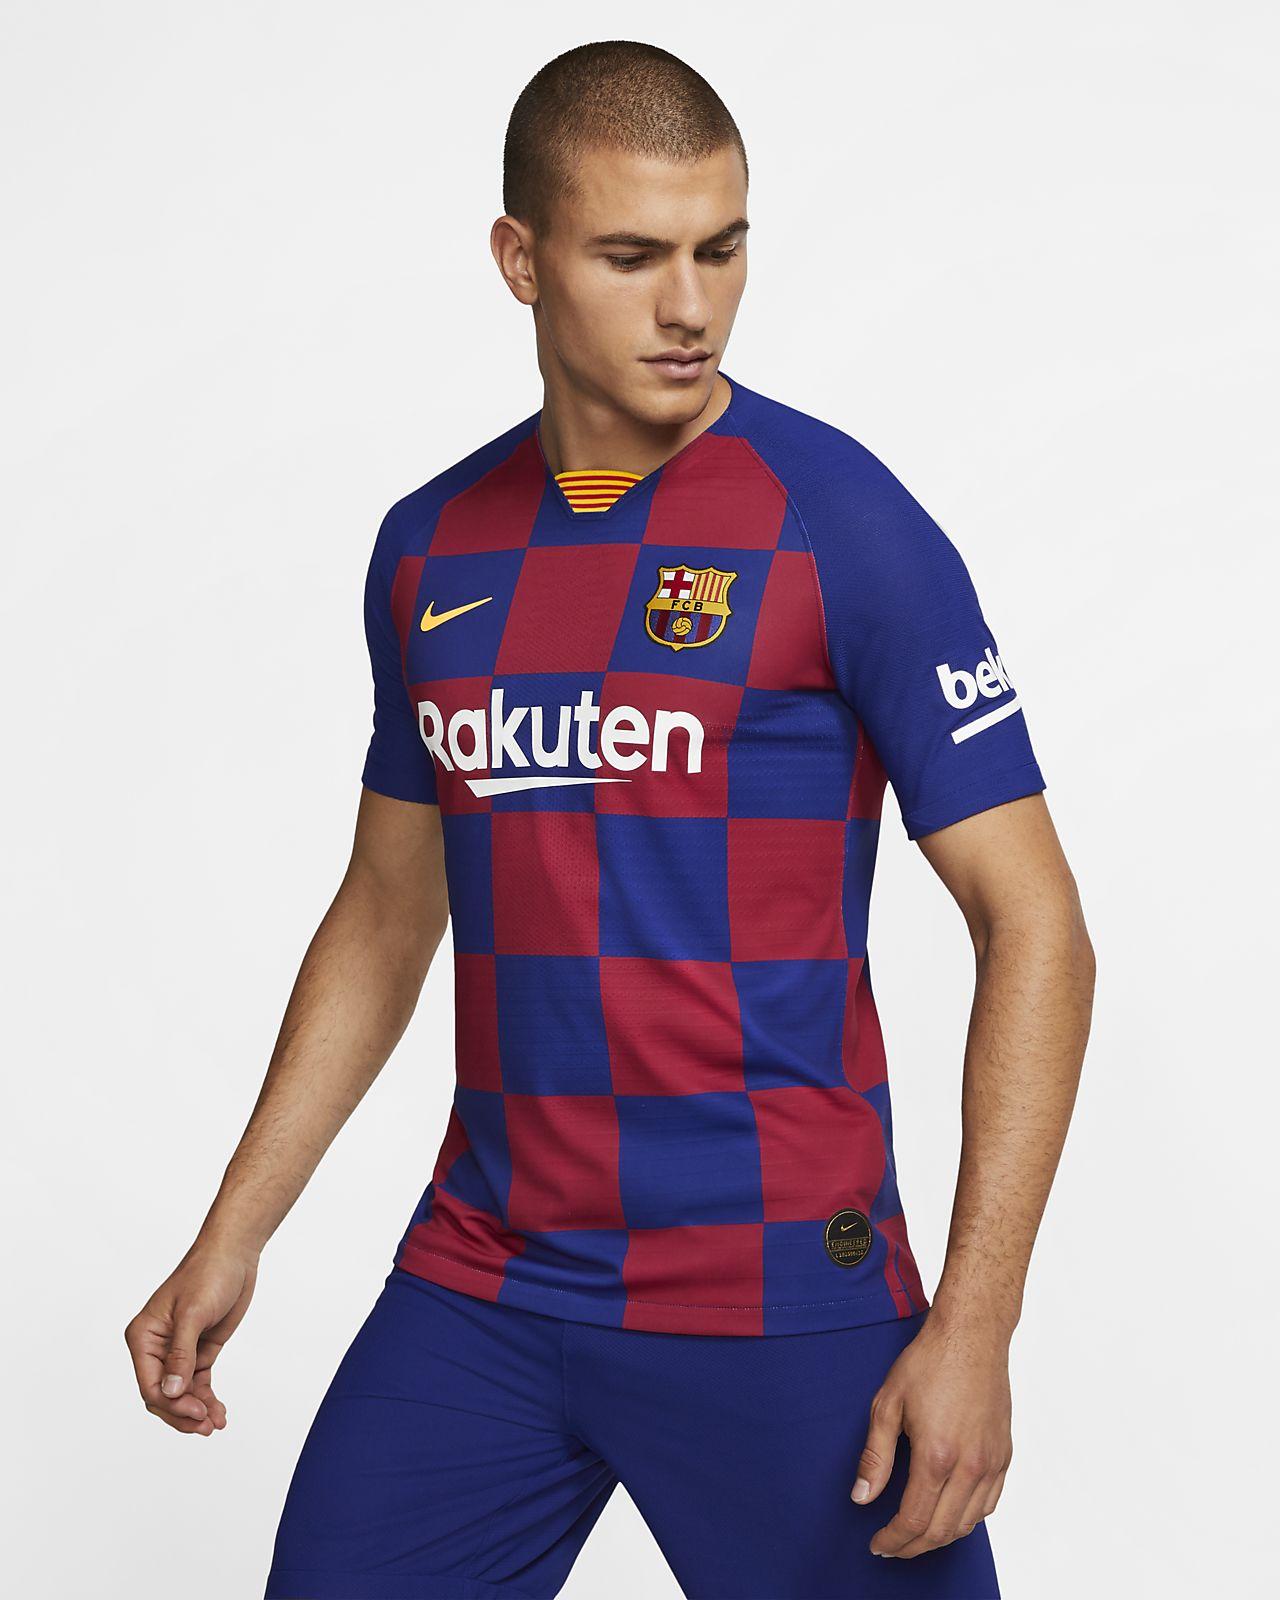 Maillot de football FC Barcelona 2019/20 Vapor Match Home pour Homme